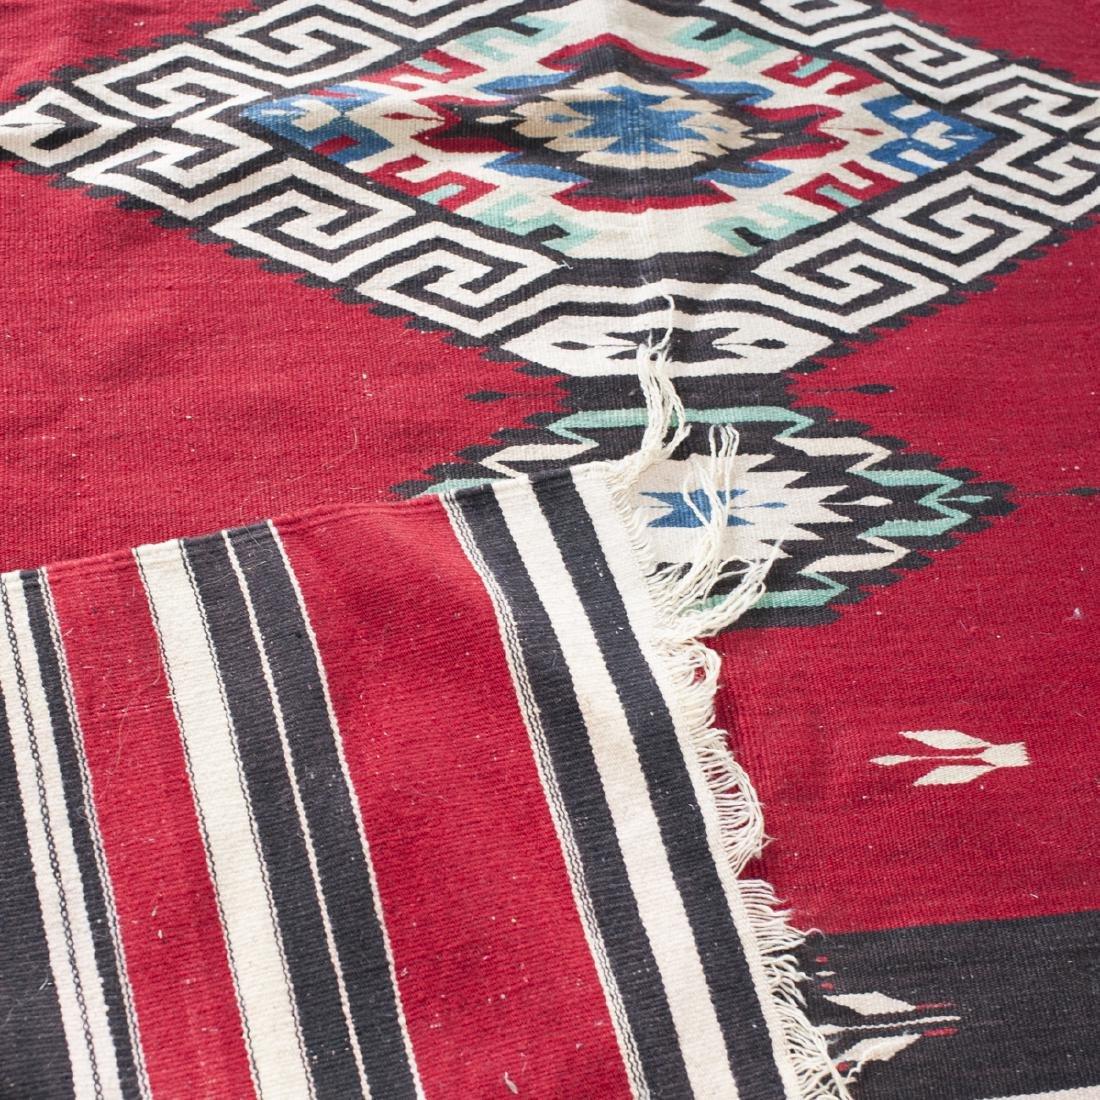 Native American Wool Rug - 3